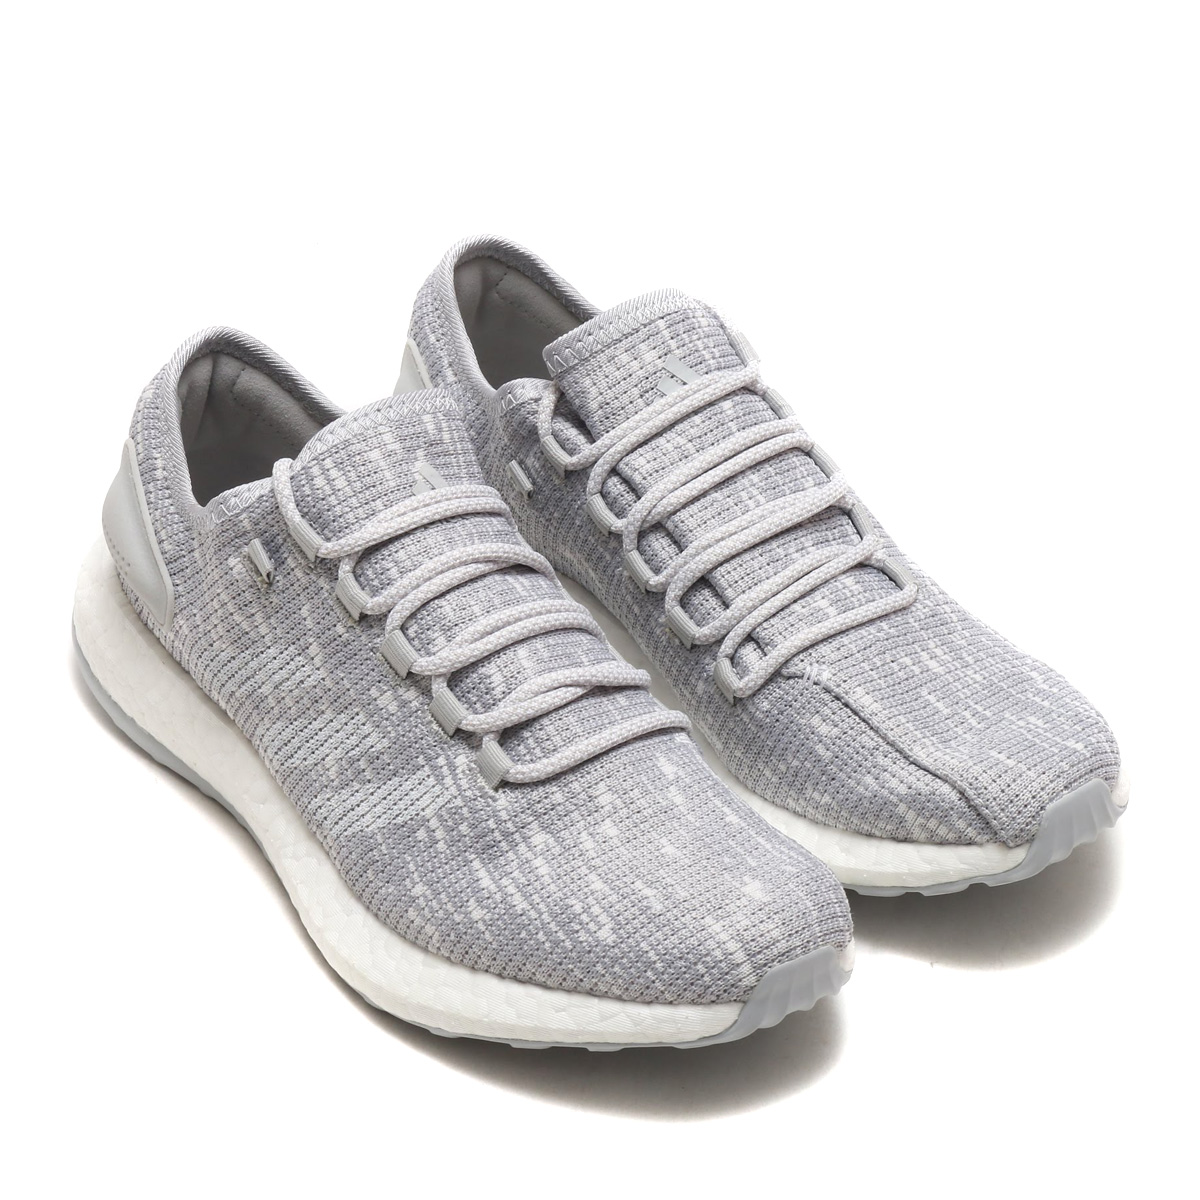 979b673c2 adidas Originals PureBOOST LTD (Adidas originals pure boost LTD) (running  white   running white   blue) 18SS-I